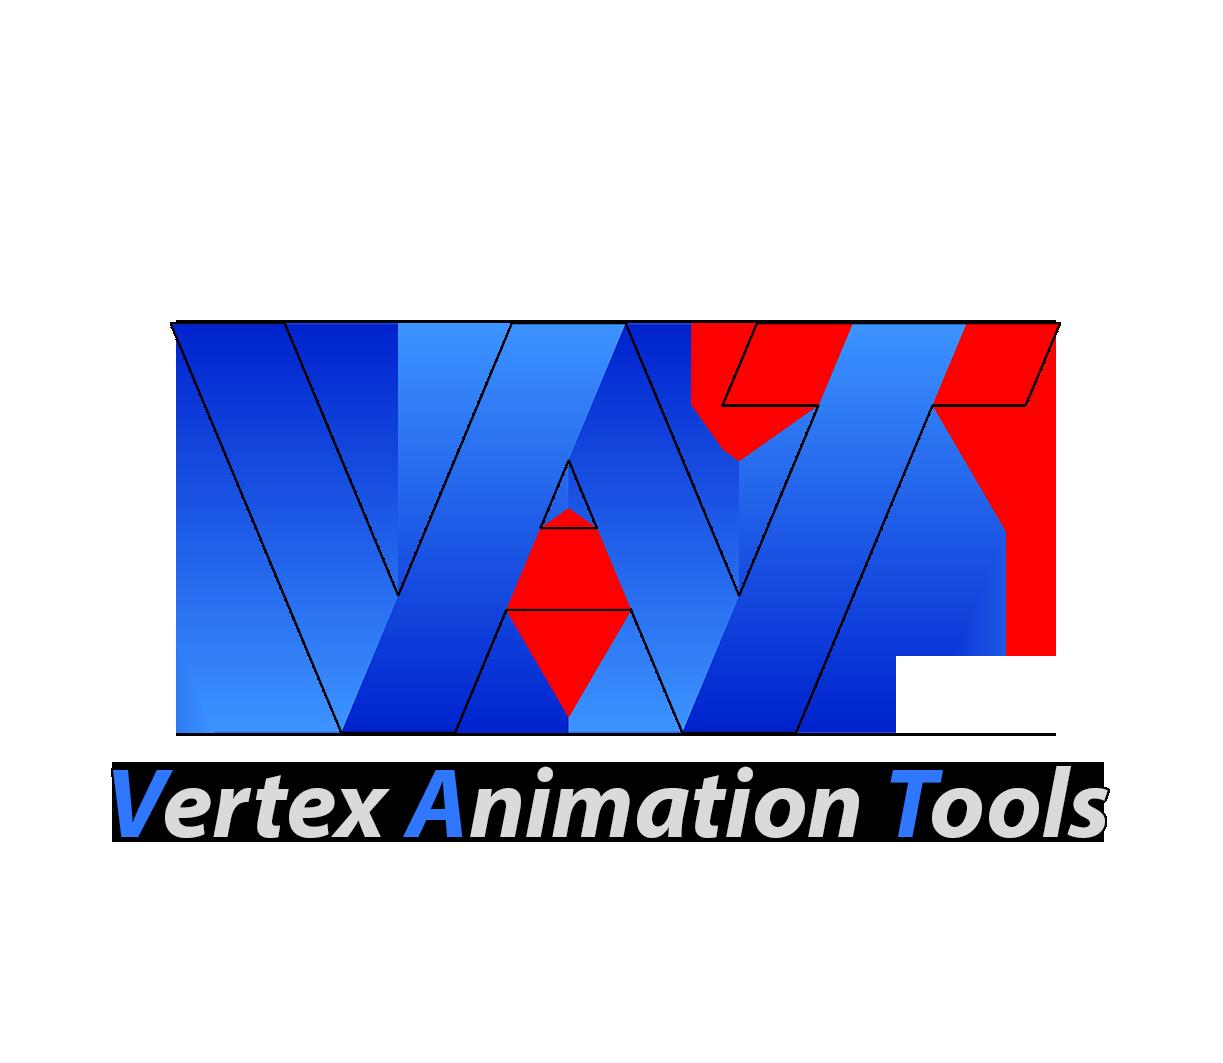 Vertex Animation Tools